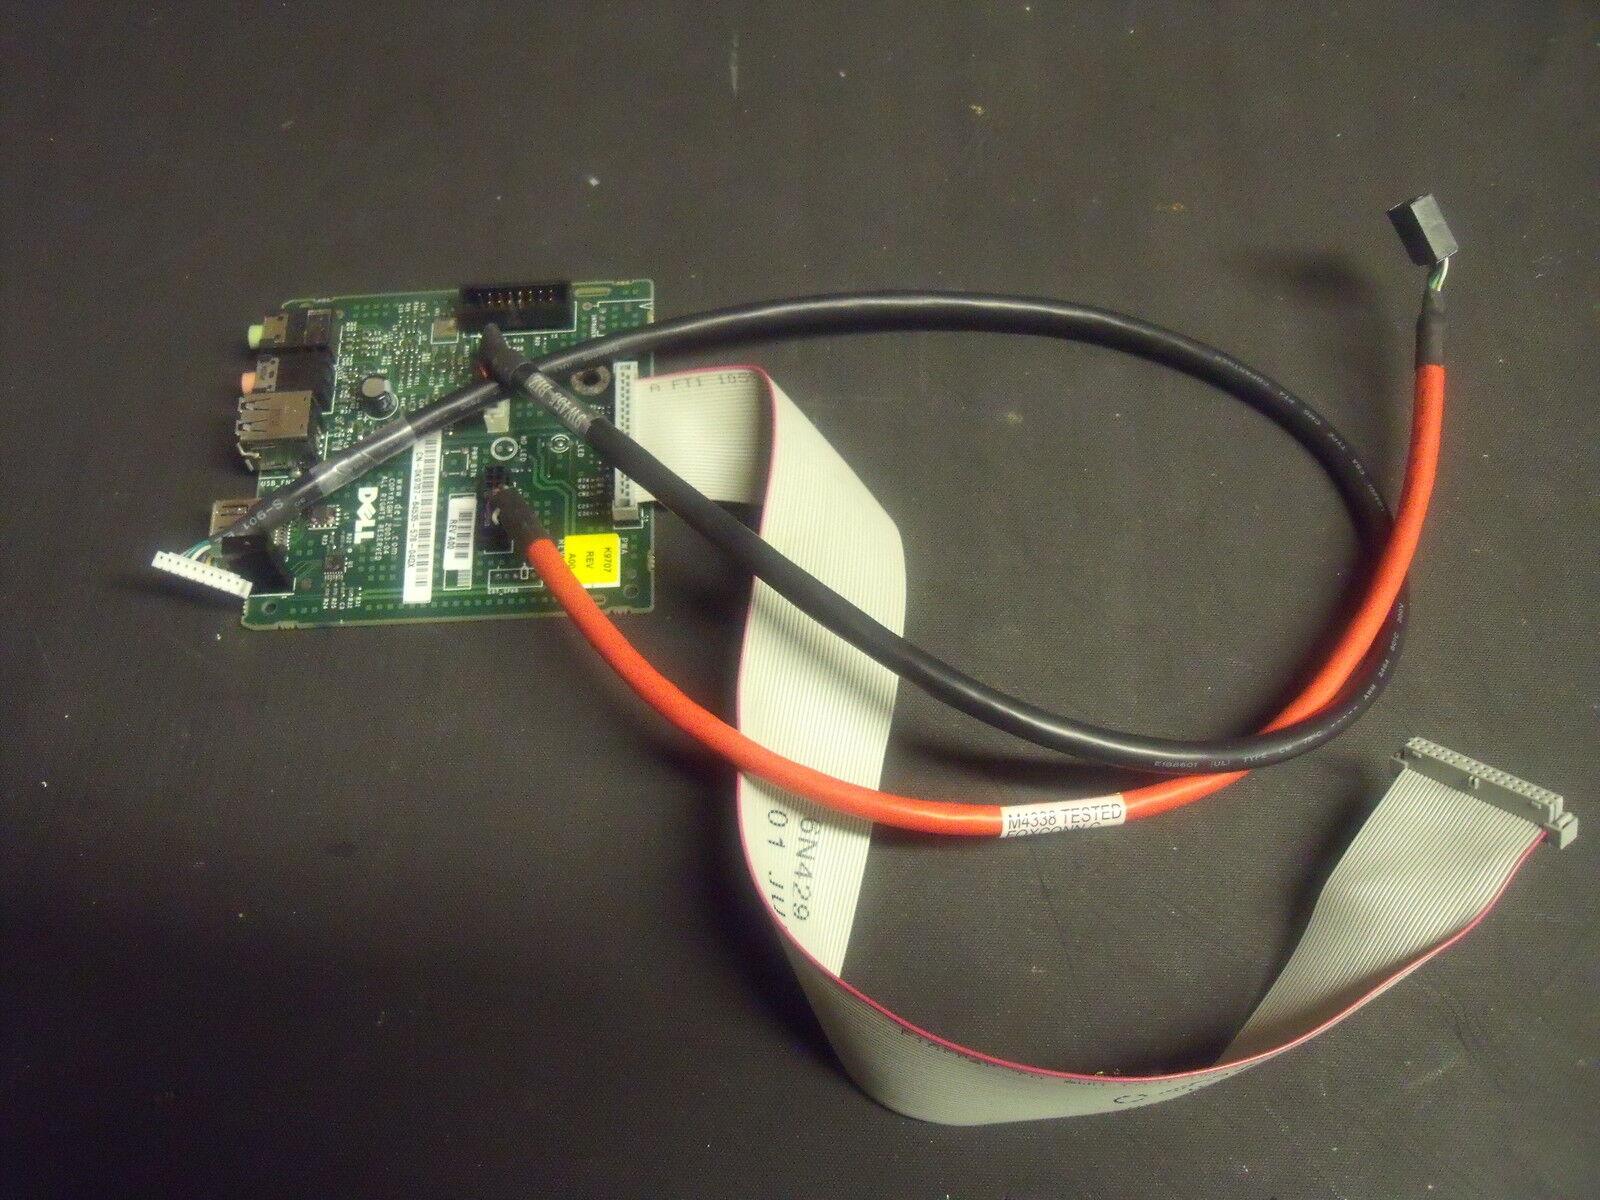 Dell XPS GEN 5 Control Panel Kit K9707,6N429,M4338,9W455